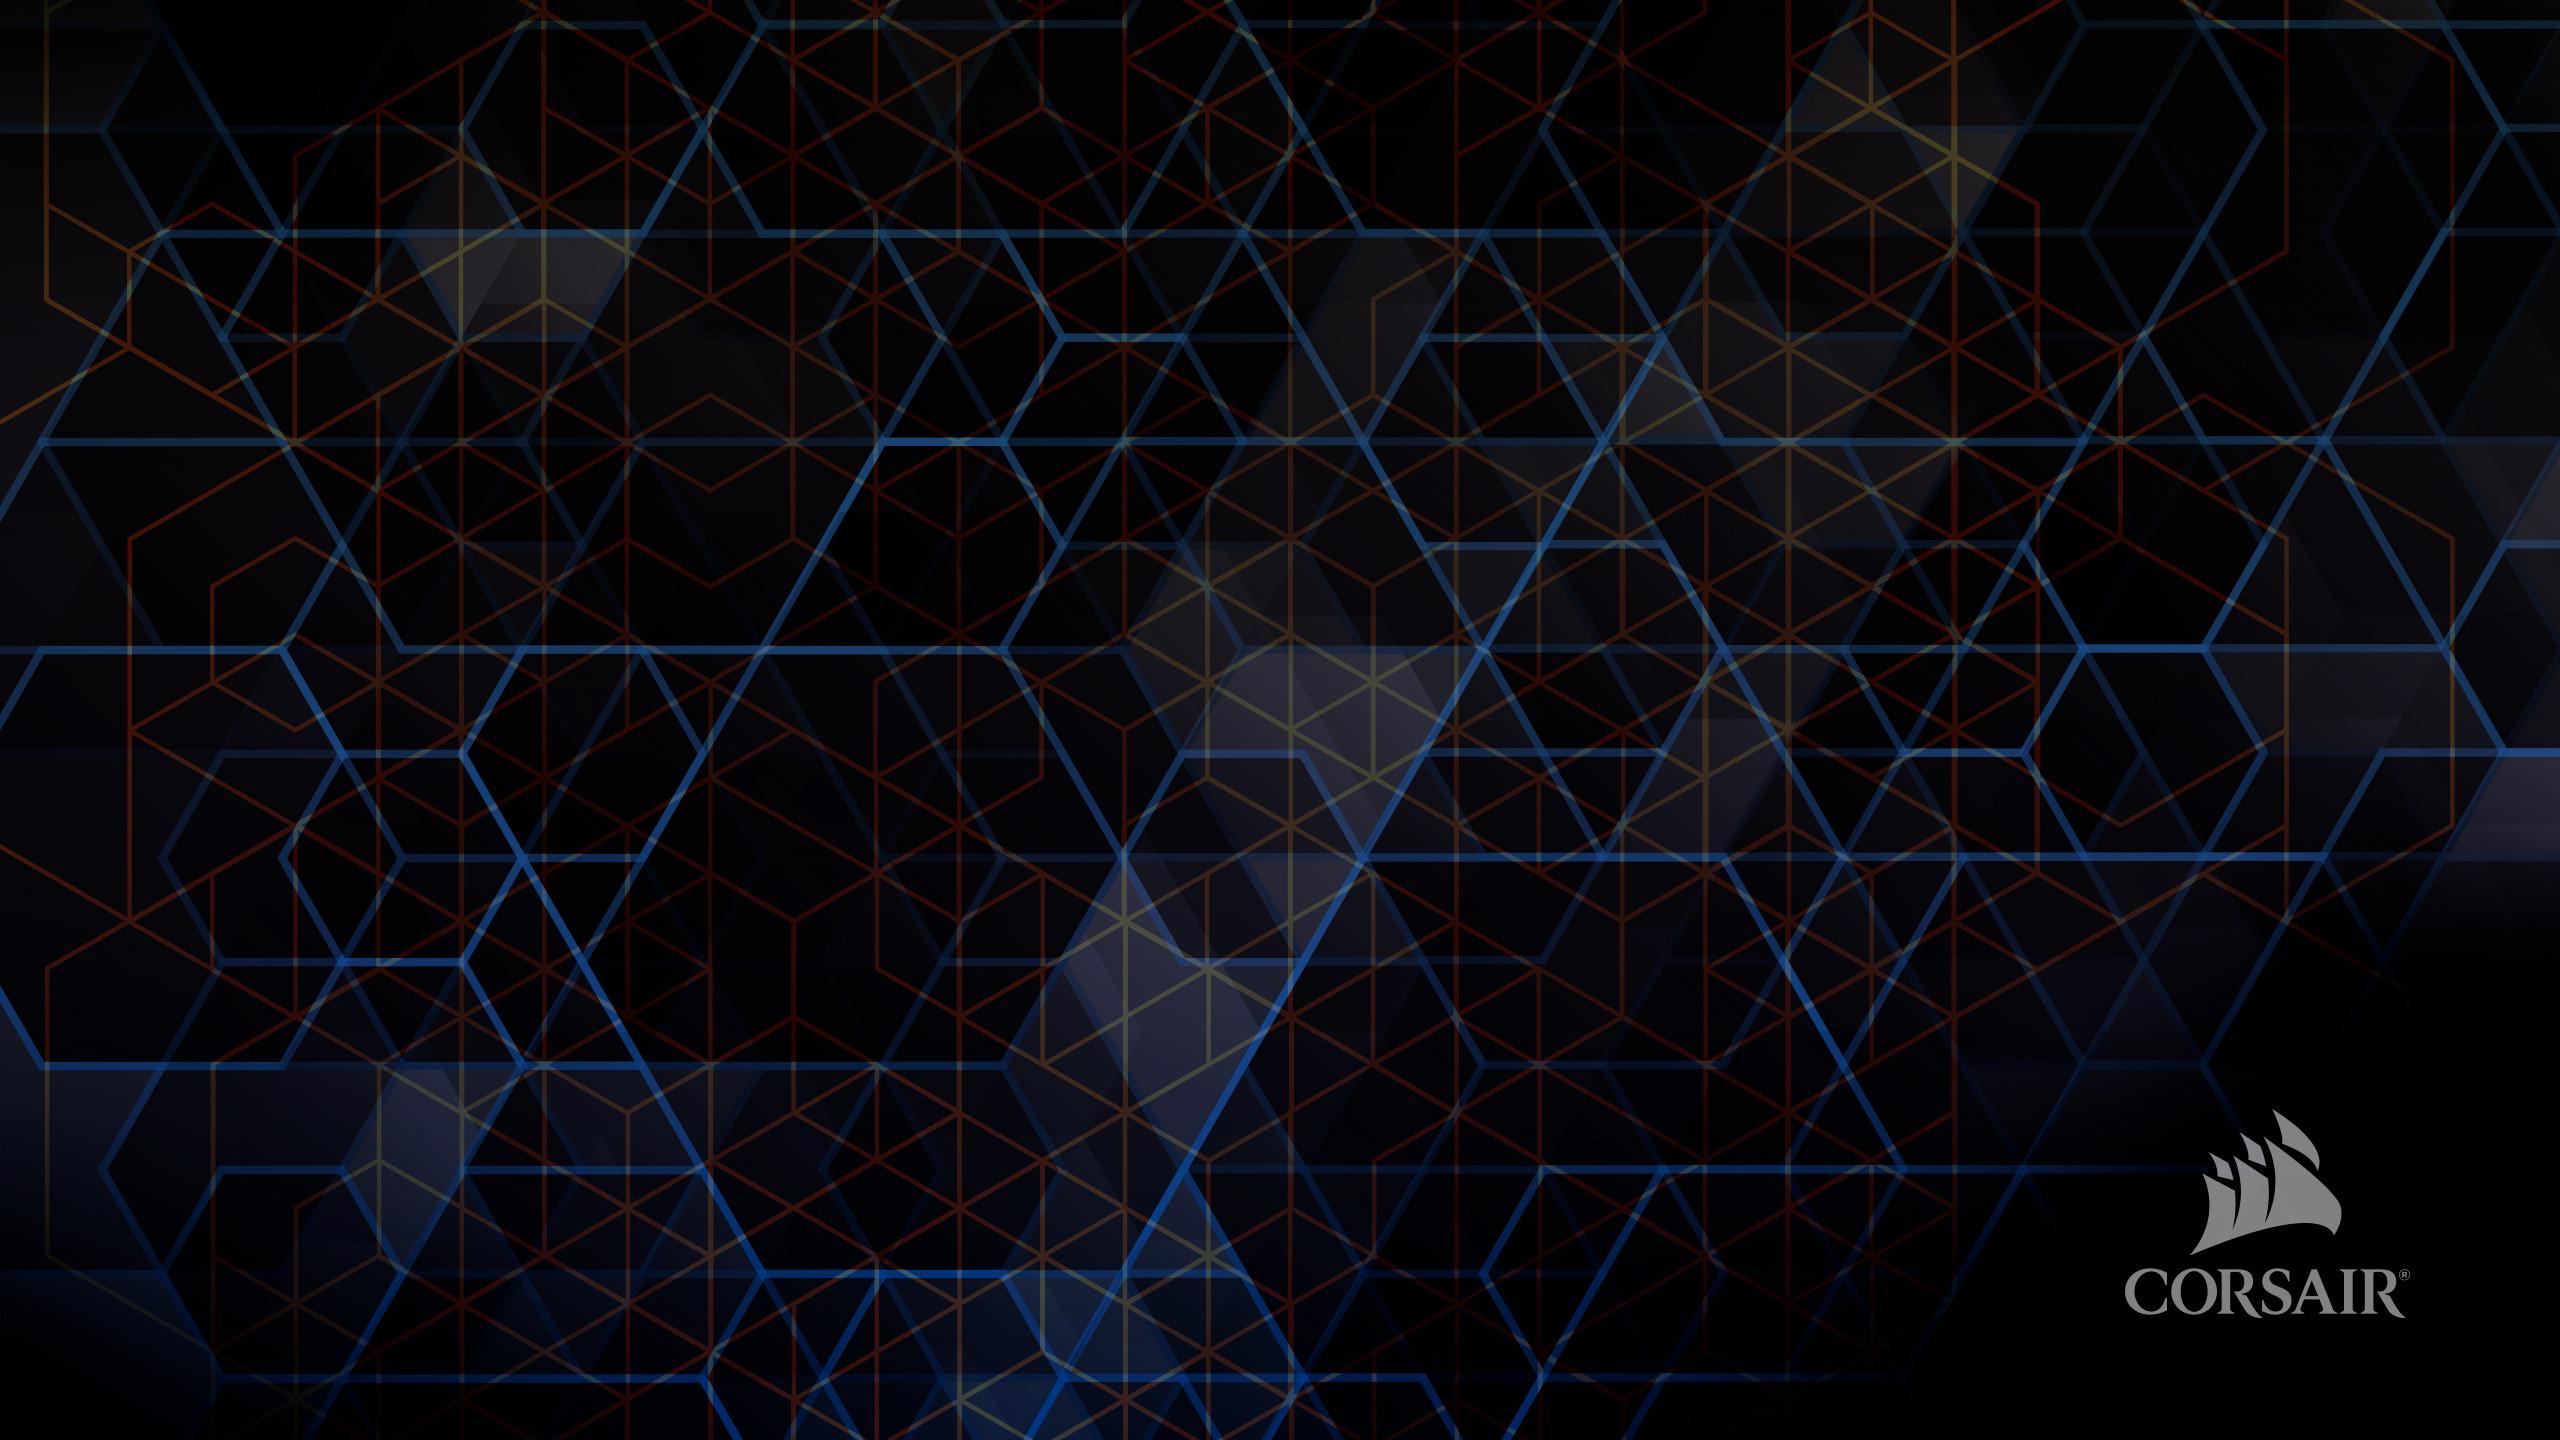 2560x1440 wallpaper windows 10 73 images for Ecran pc 2560 x 1440